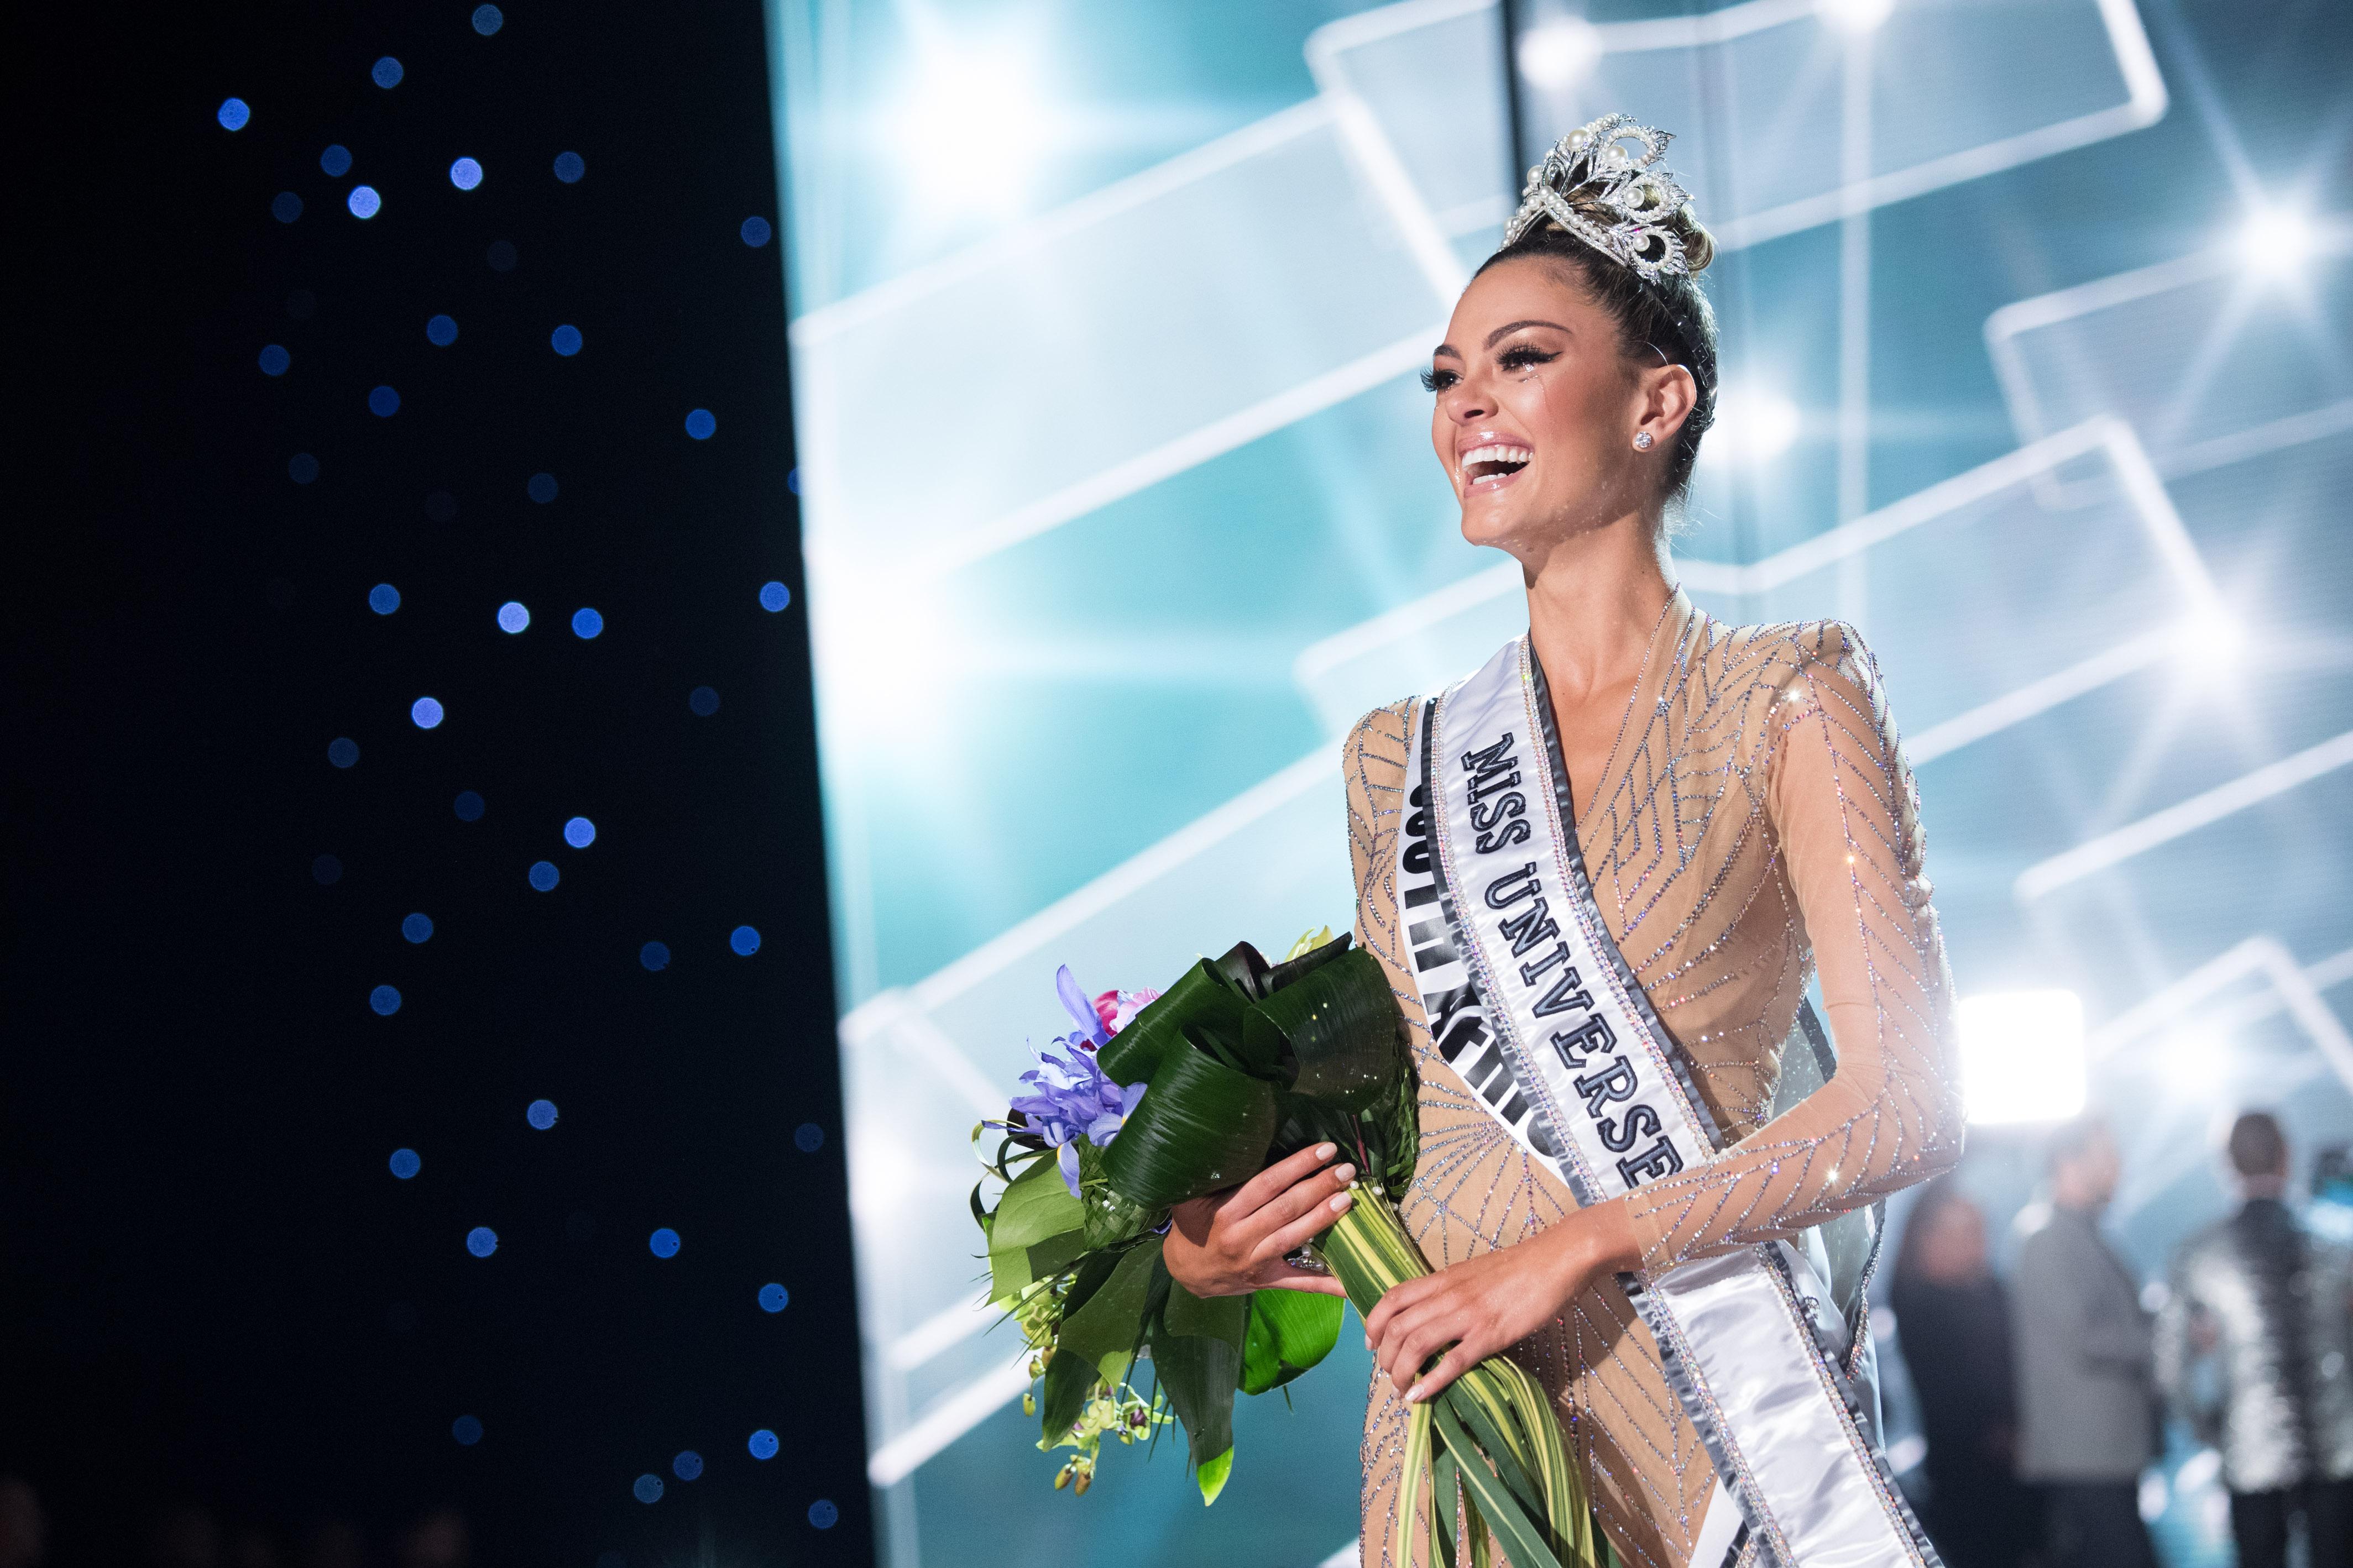 Meet Miss Universe 2017 Demi-Leigh Nel-Peters